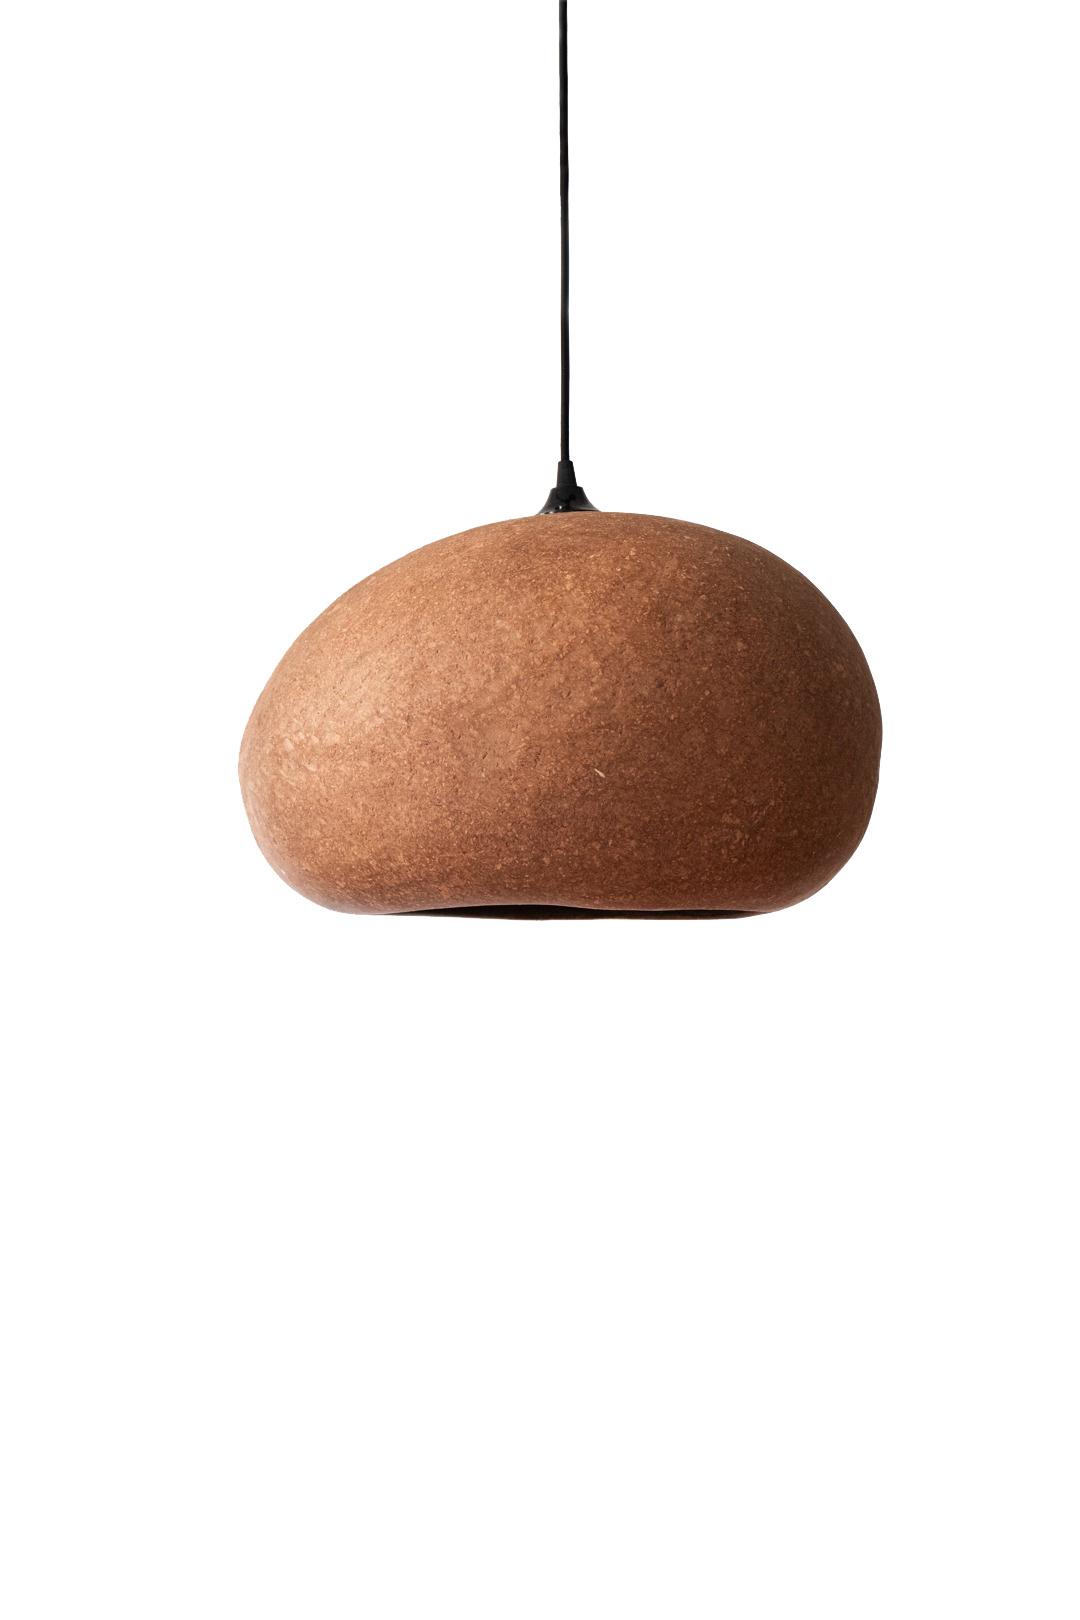 Ay Illuminate Lampe Suspension en Terracotta L - carton recyclé - 45x36x25cm - Ay illuminate